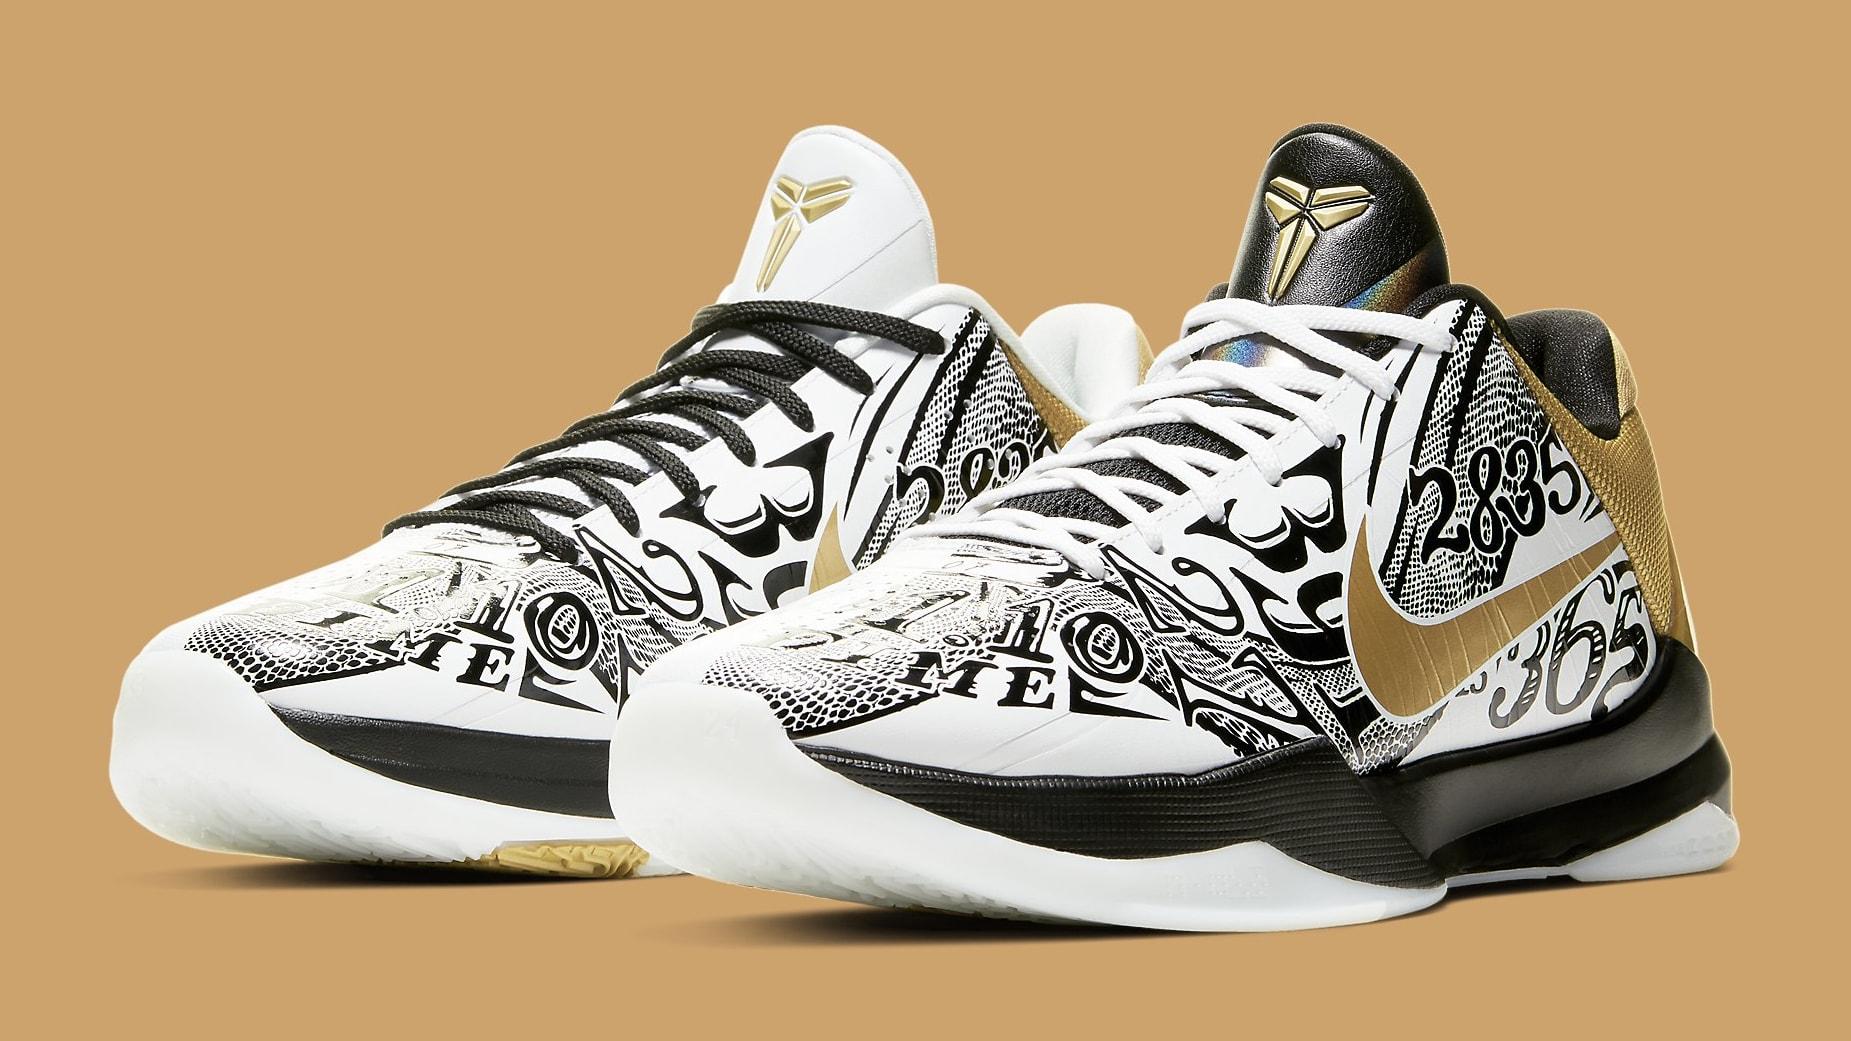 Nike Kobe 5 Big Stage Parade Release Date CT8014-100 Pair